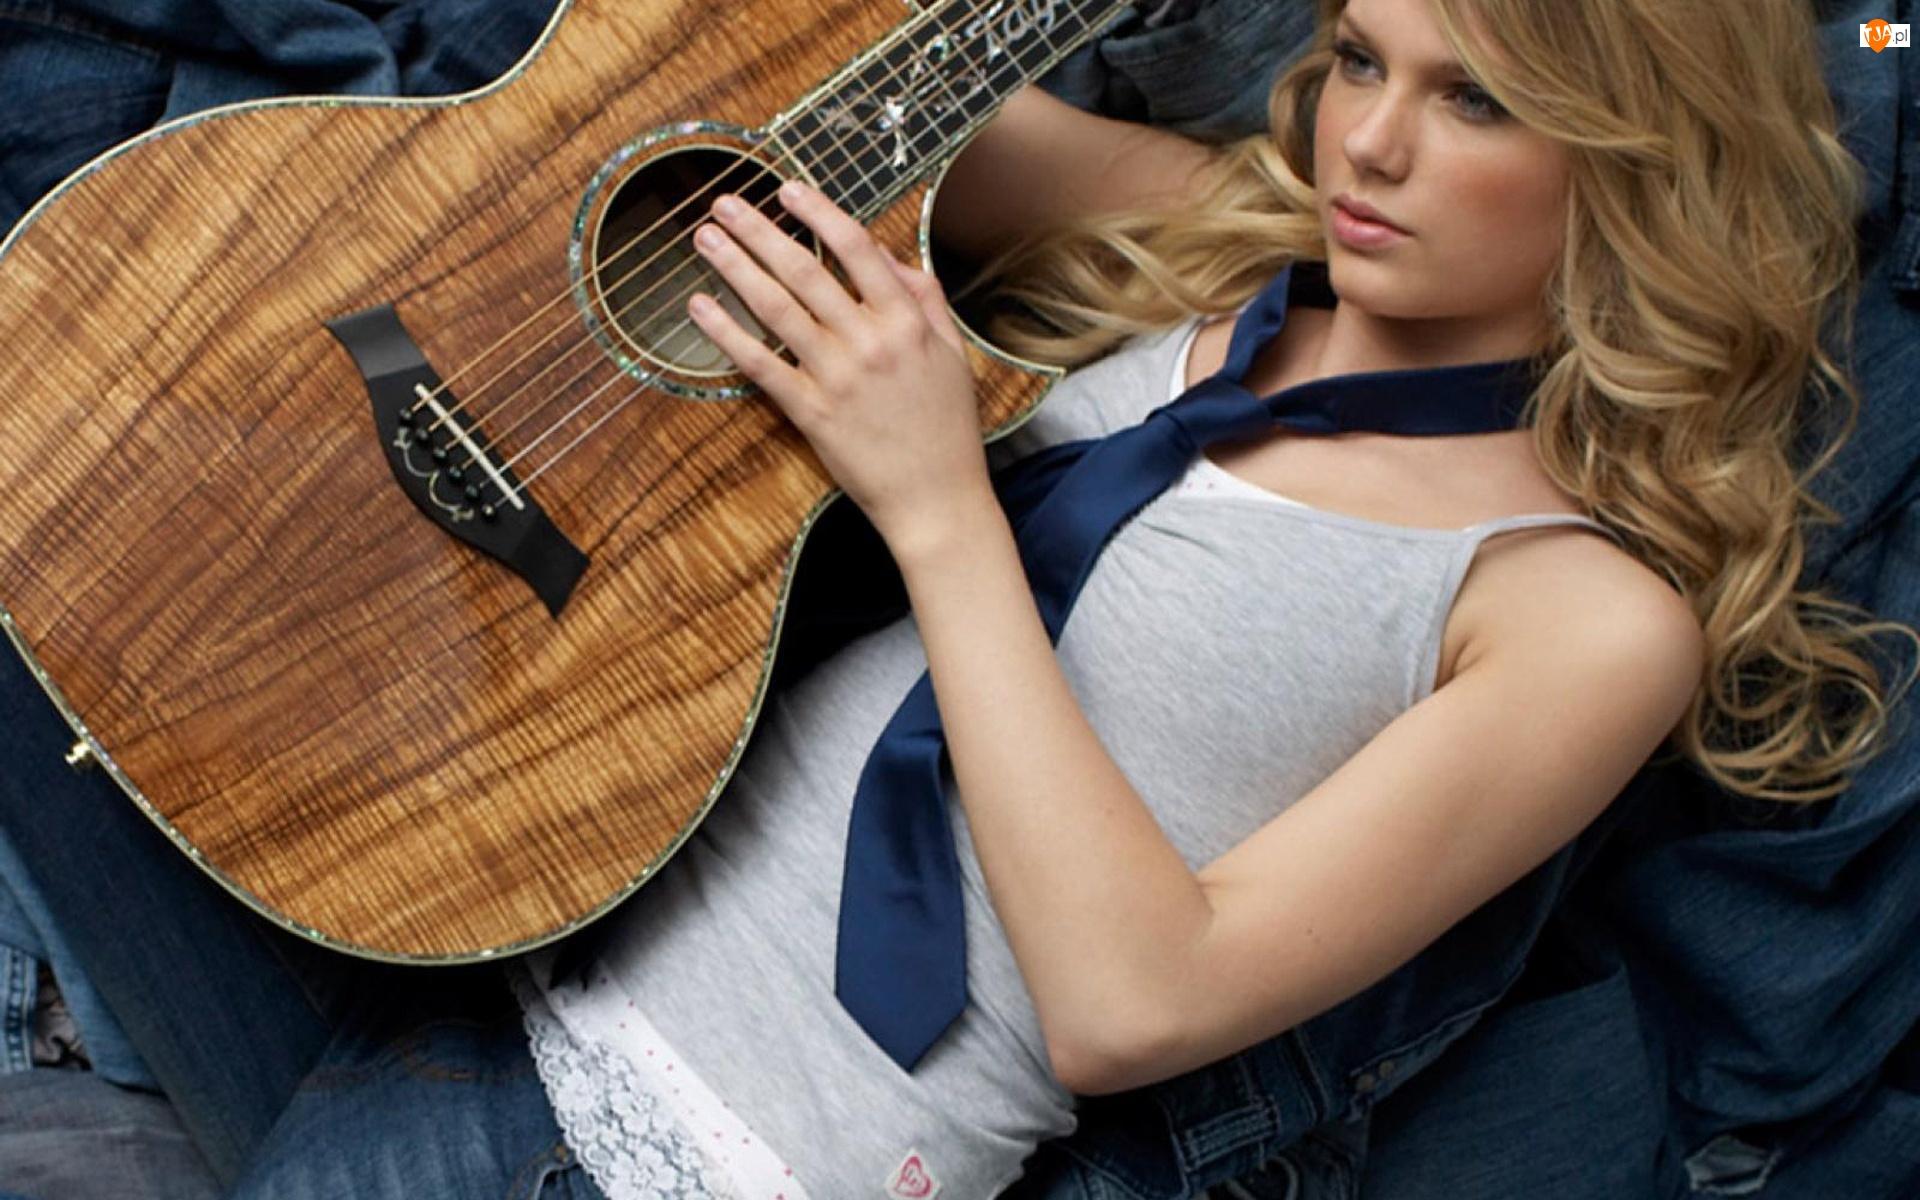 Krawat, Gitara, Kobieta